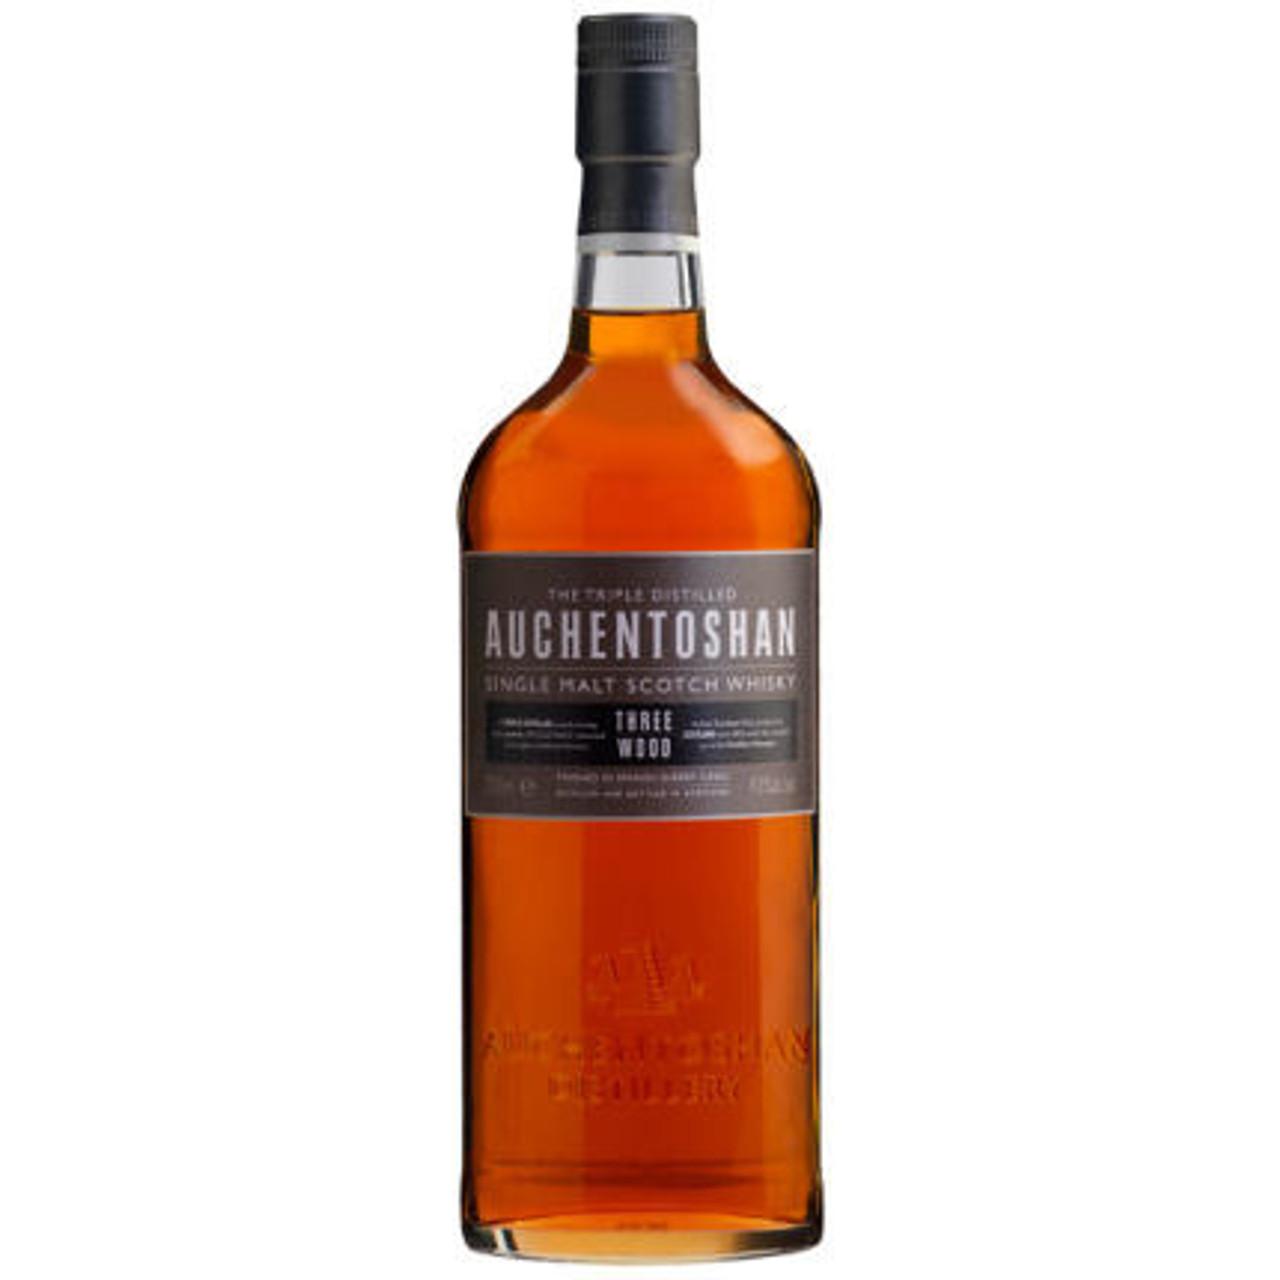 Auchentoshan 3 Wood Single Malt Scotch Whisky 750ml